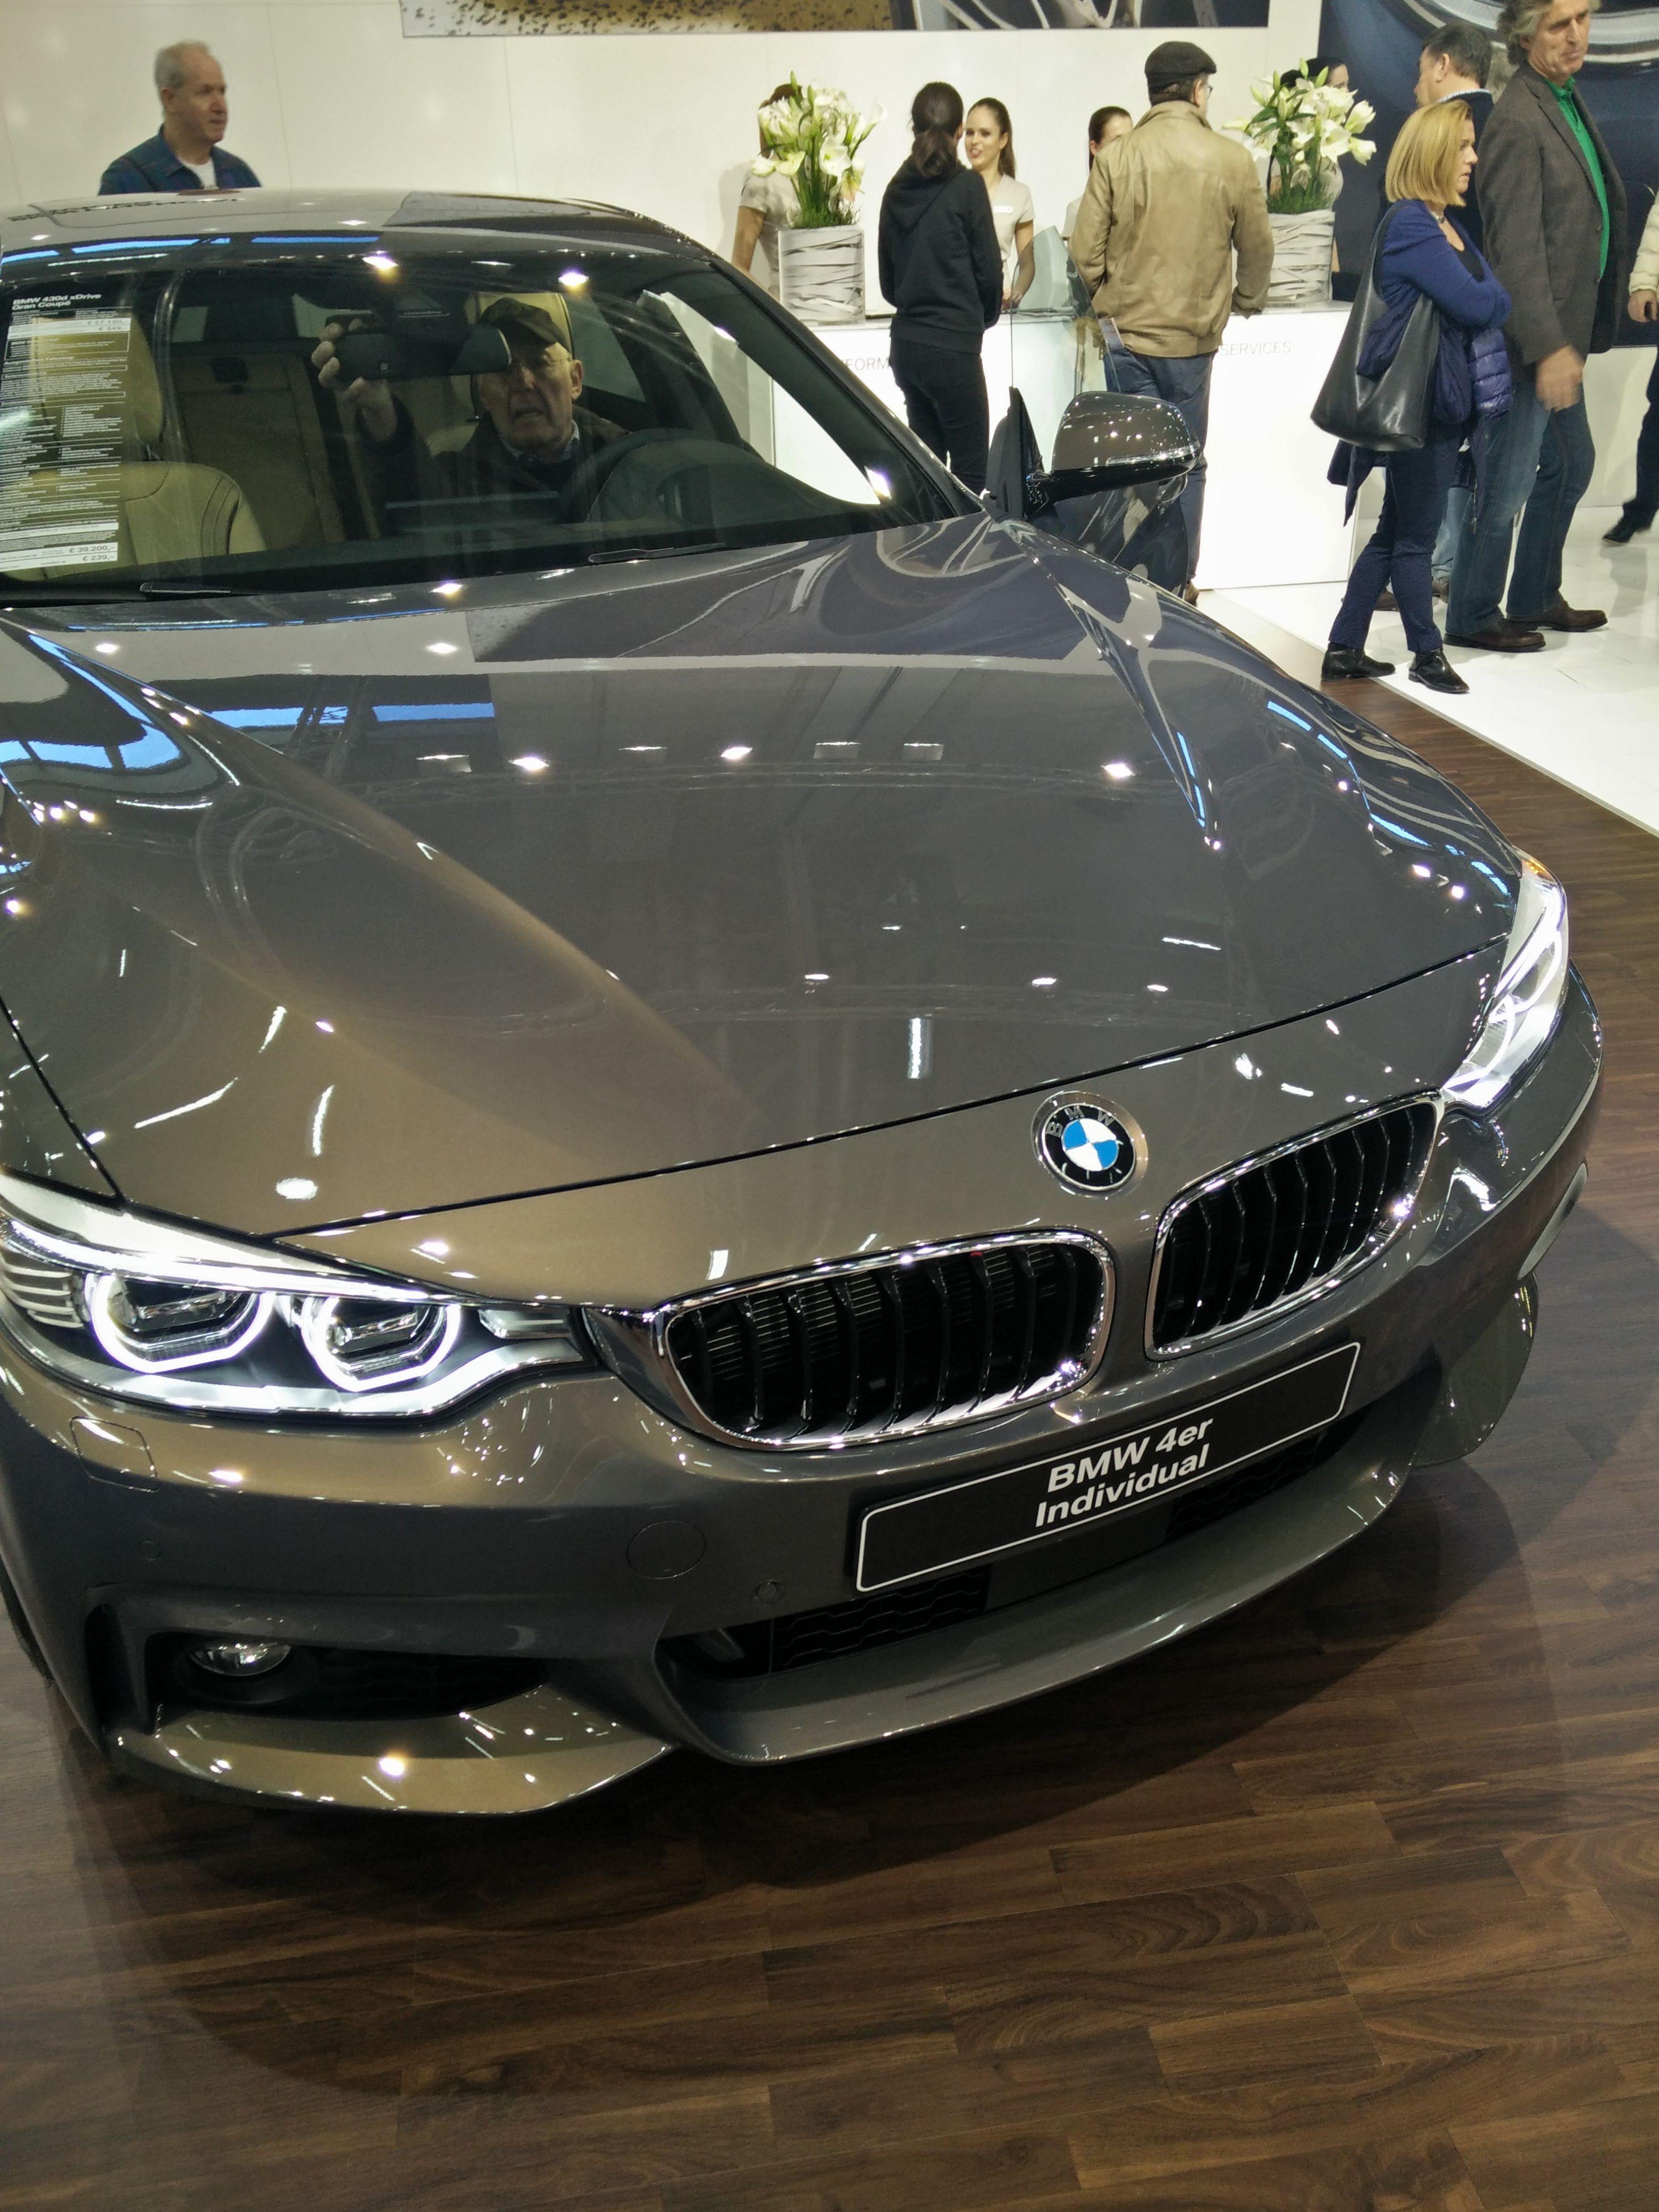 Vienna autoshow 2016 impressions mytutor